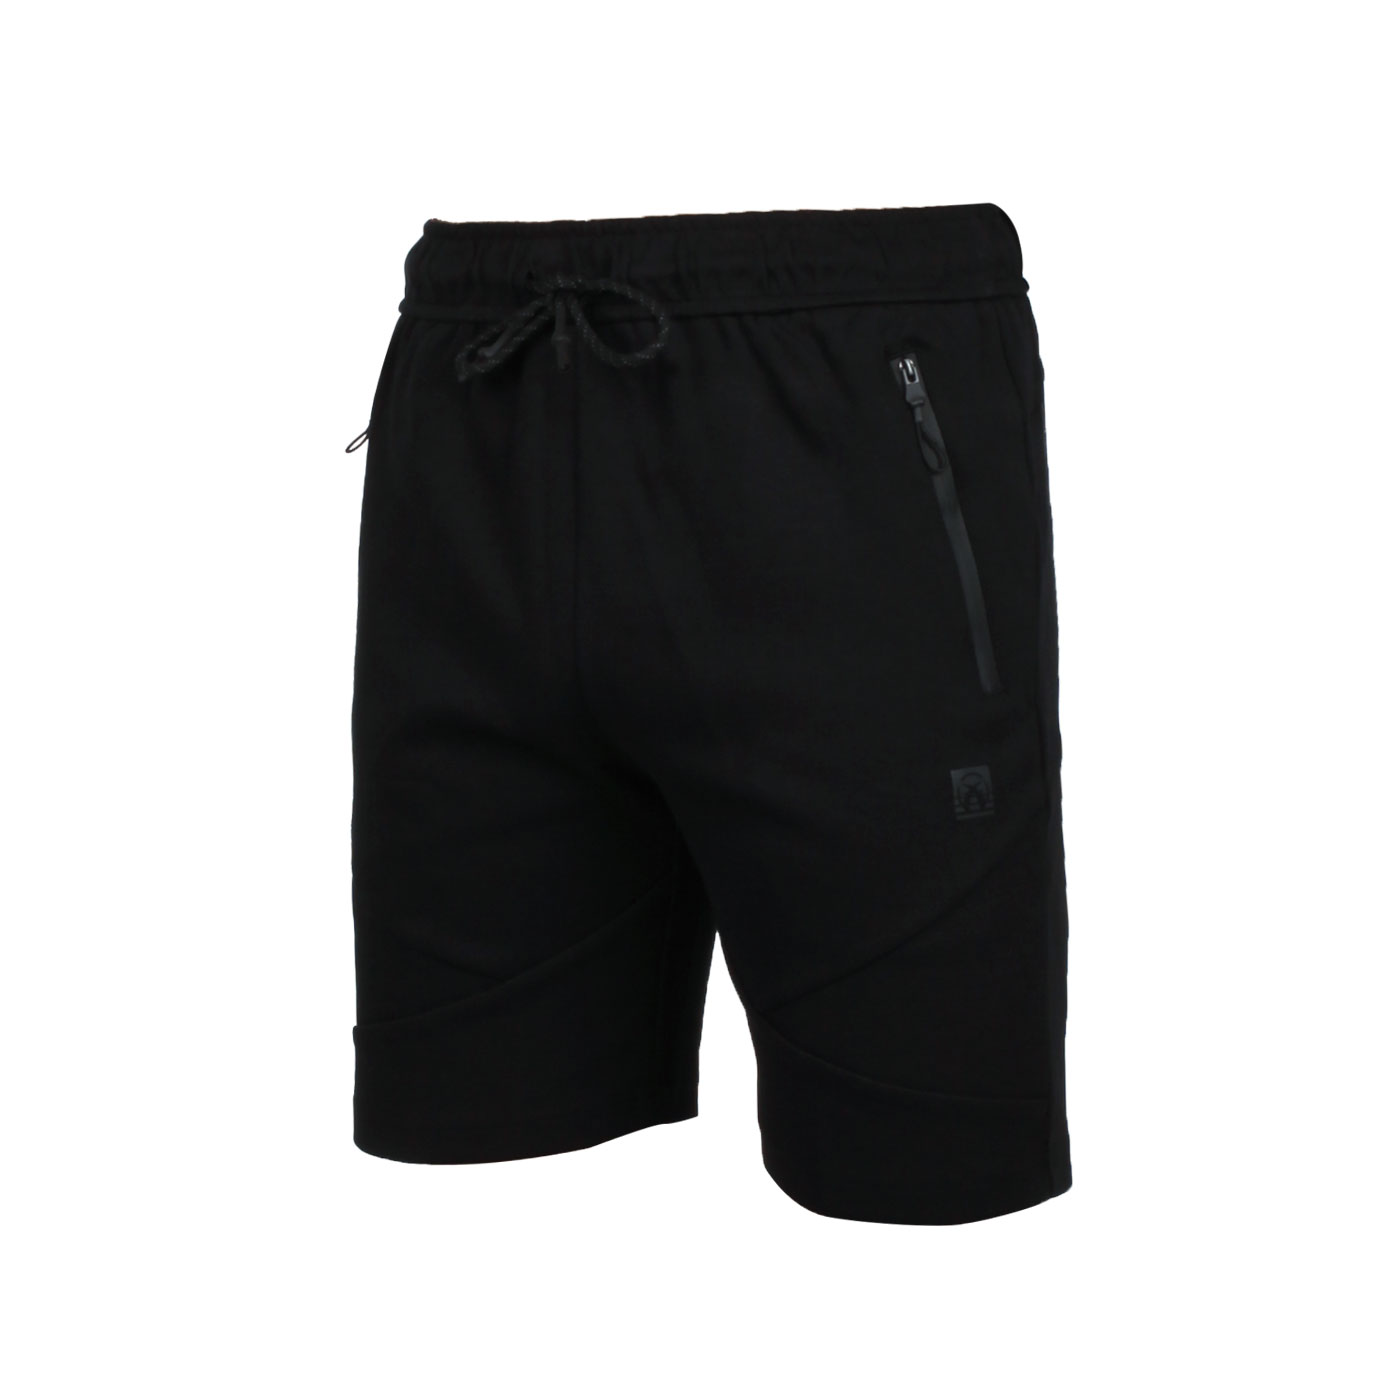 FIRESTAR 男款棉質休閒短褲 C0521-10